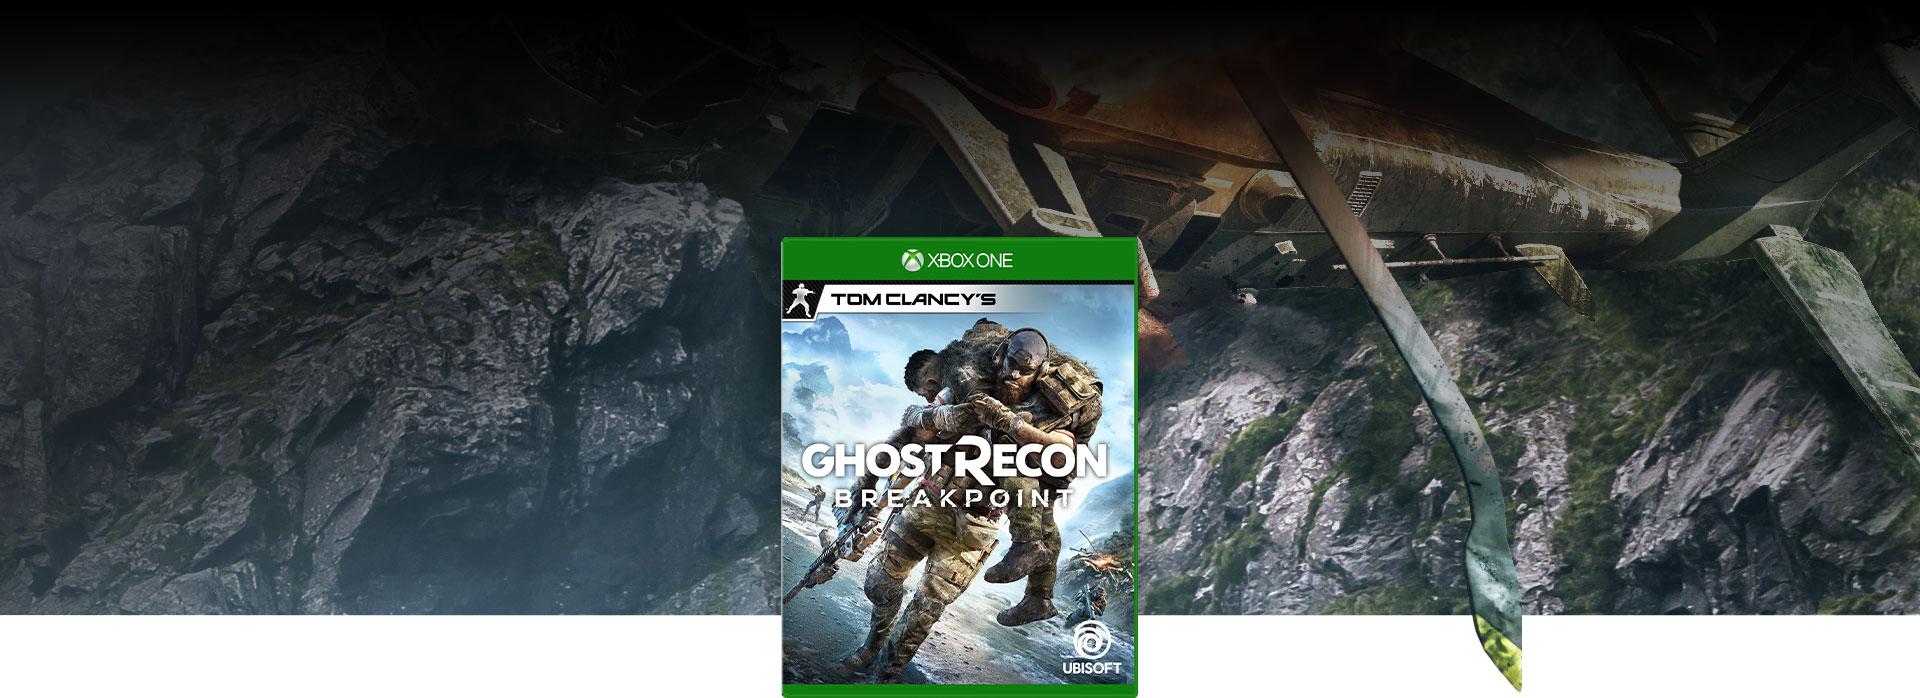 Opakowanie gry Tom Clancy's Ghost Recon Breakpoint, w tle rozbity w górach helikopter